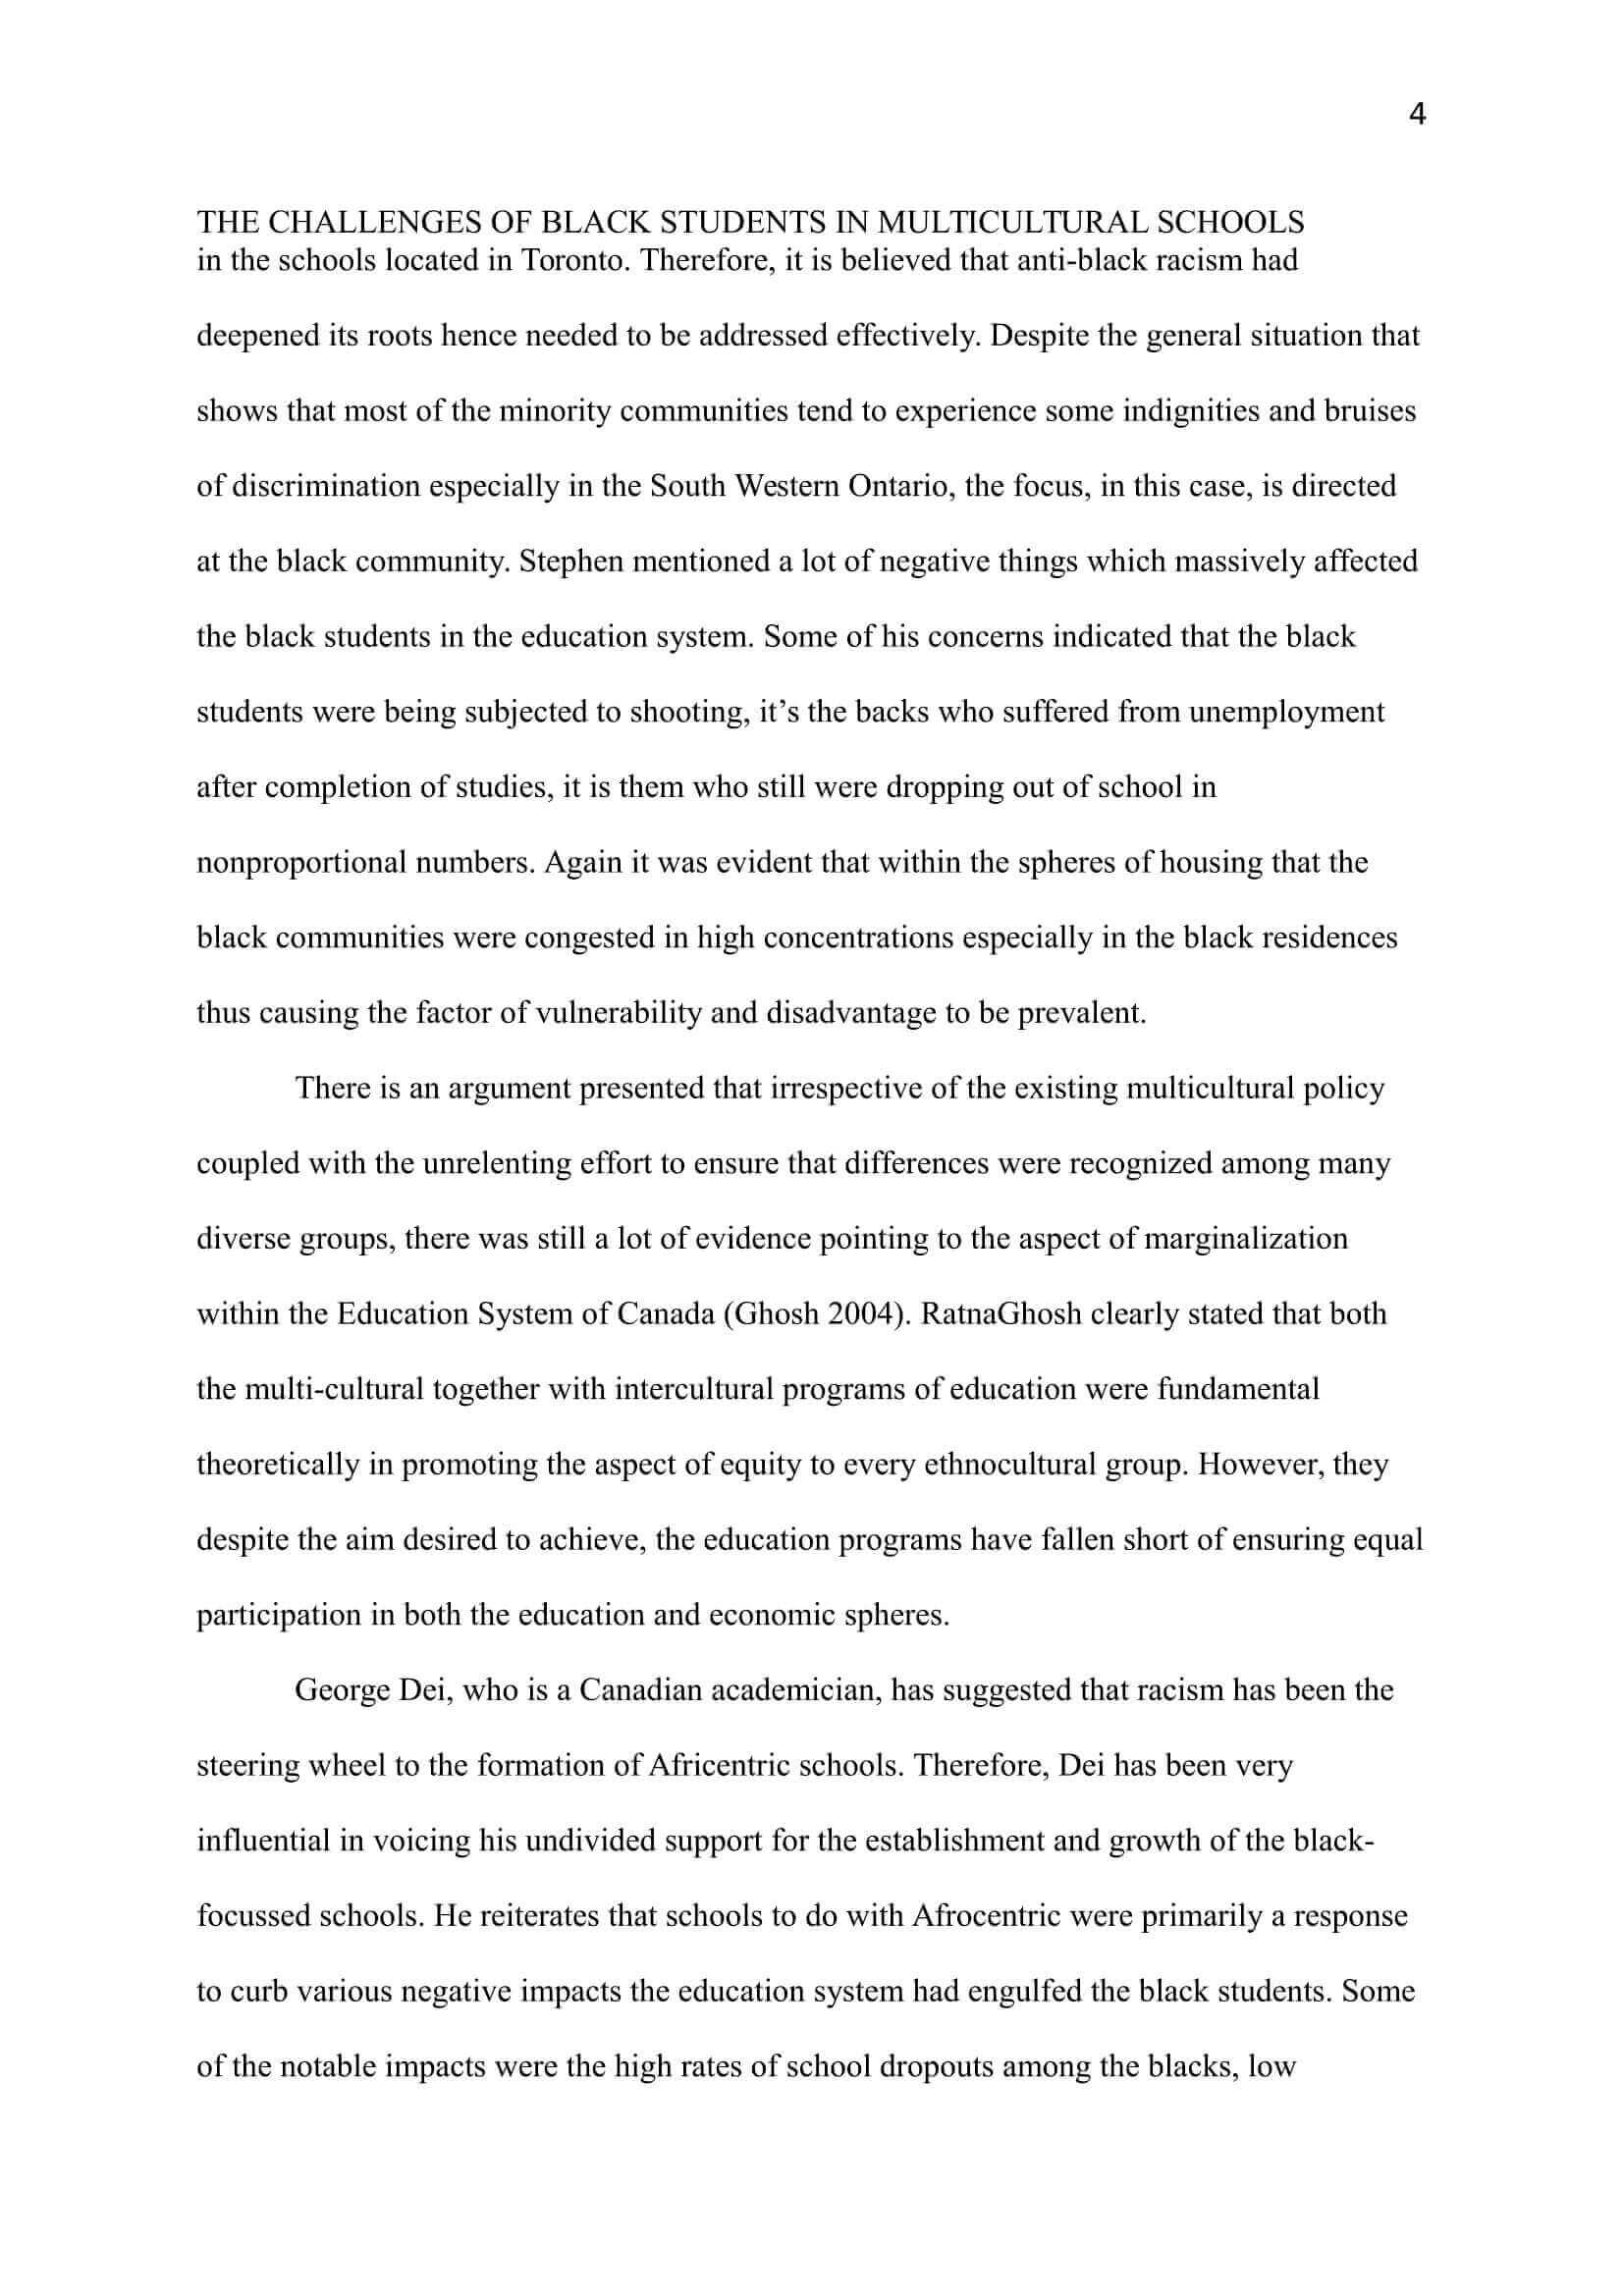 i want someone to write my essay